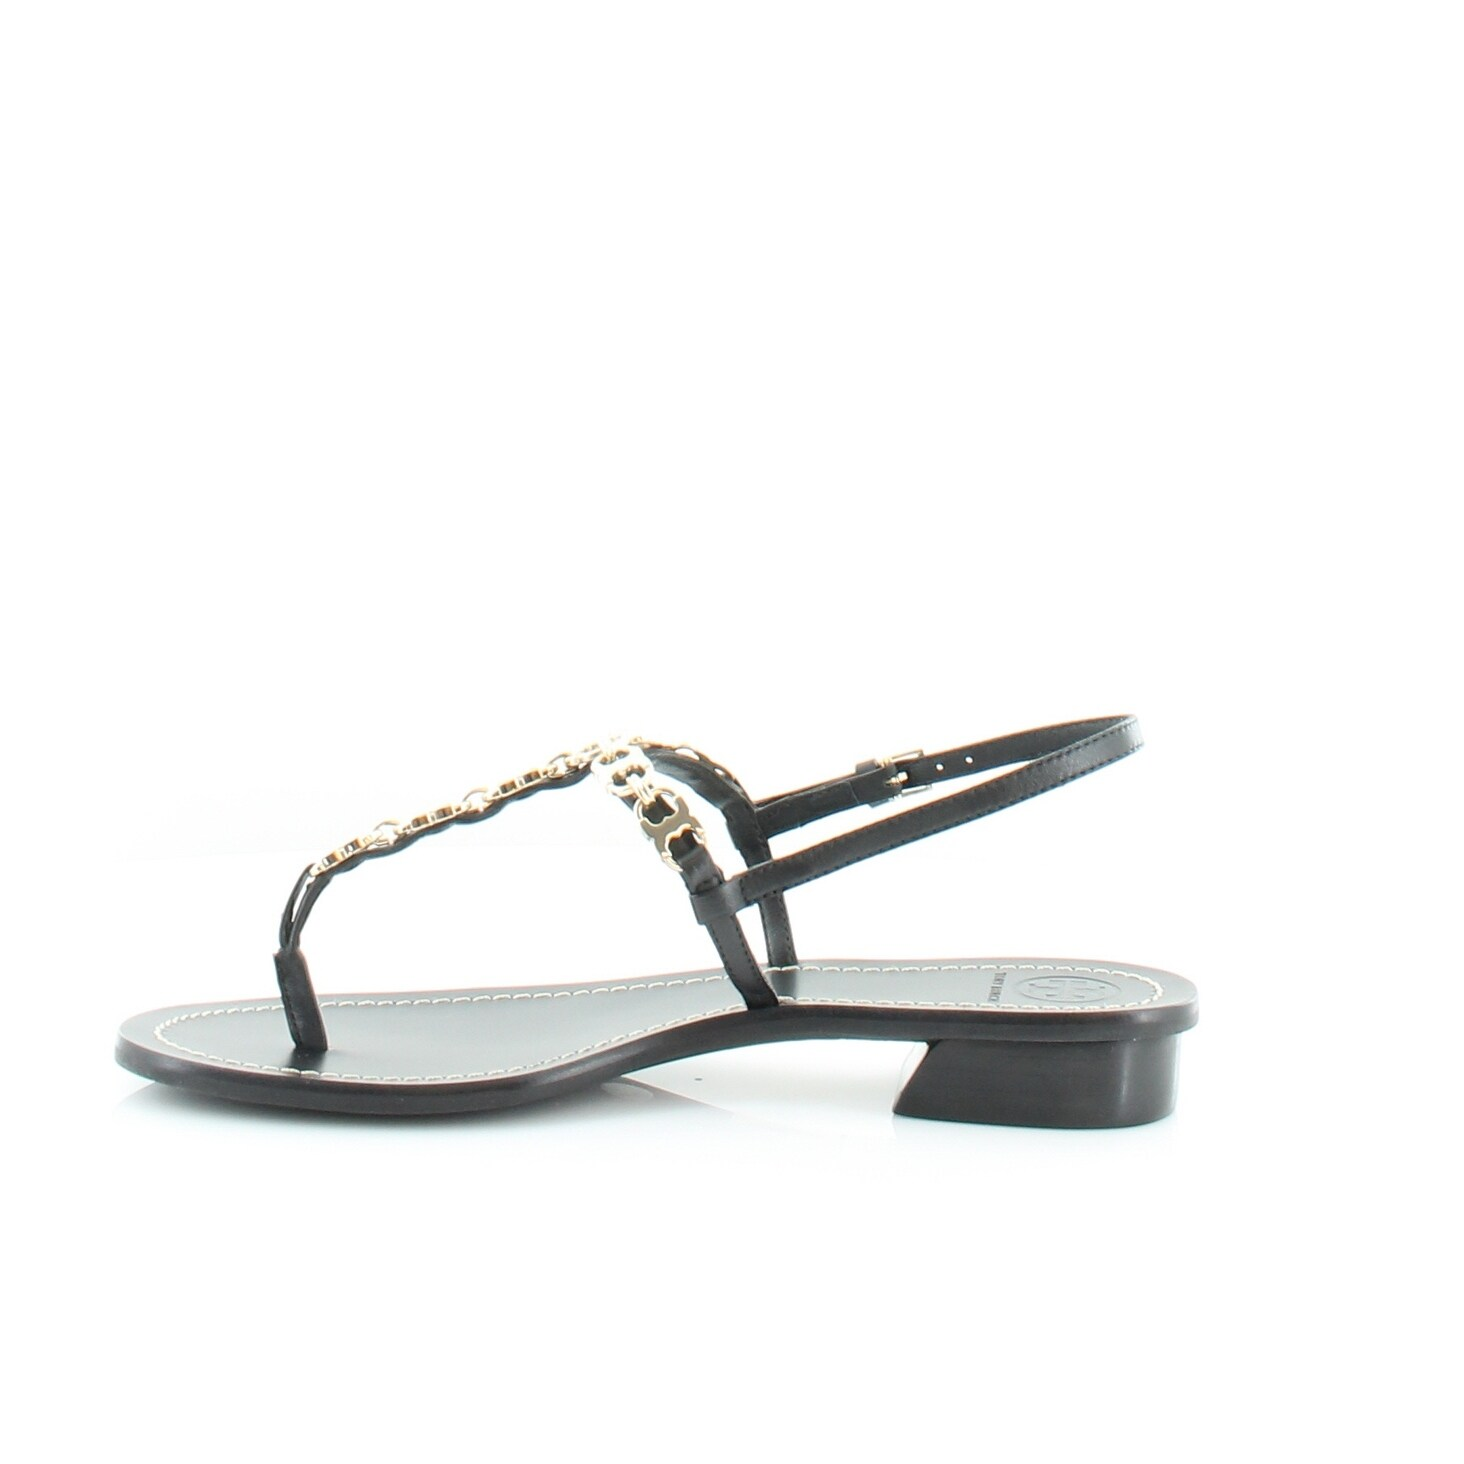 6c3f91dd3502 Shop Tory Burch Gemini Link T Strap Women s Sandals   Flip Flops Black -  Free Shipping Today - Overstock - 21551417